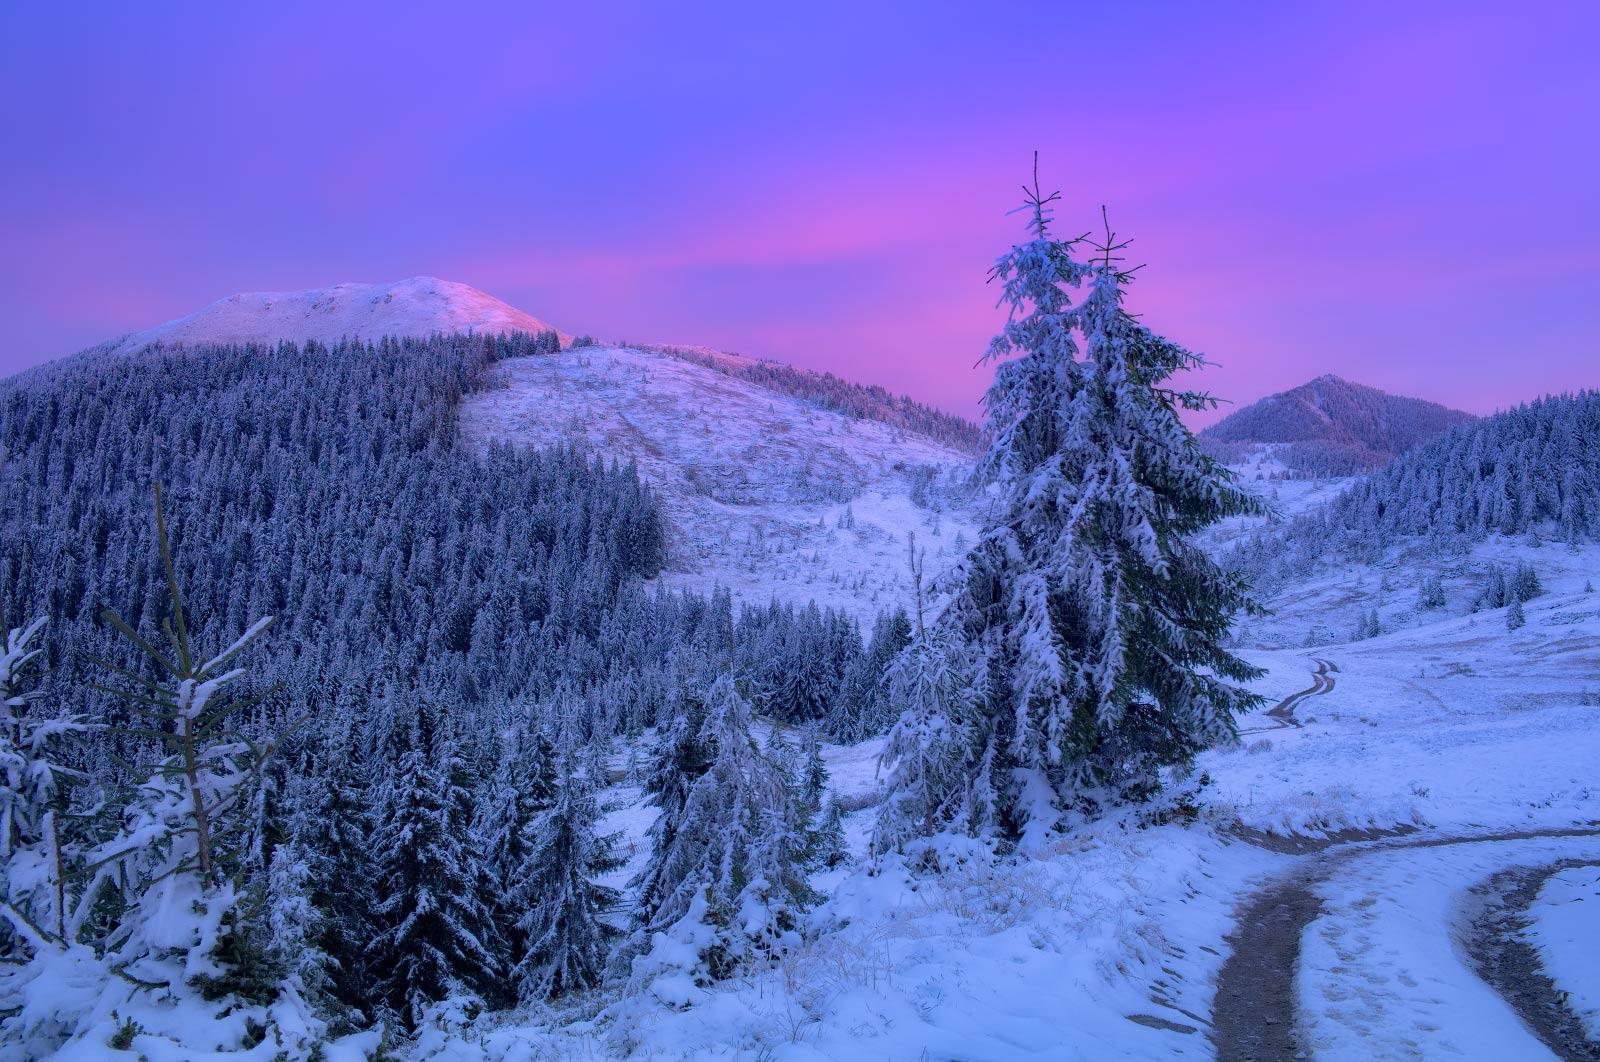 #nature, #туман, #лес, #oсень, #украина, #карпаты, #пейзаж, #закат, #туман, #солнце, #свет, #mountain range, #mountains, #туризм, #лес, #nature, #природа,, Морозов Леонид